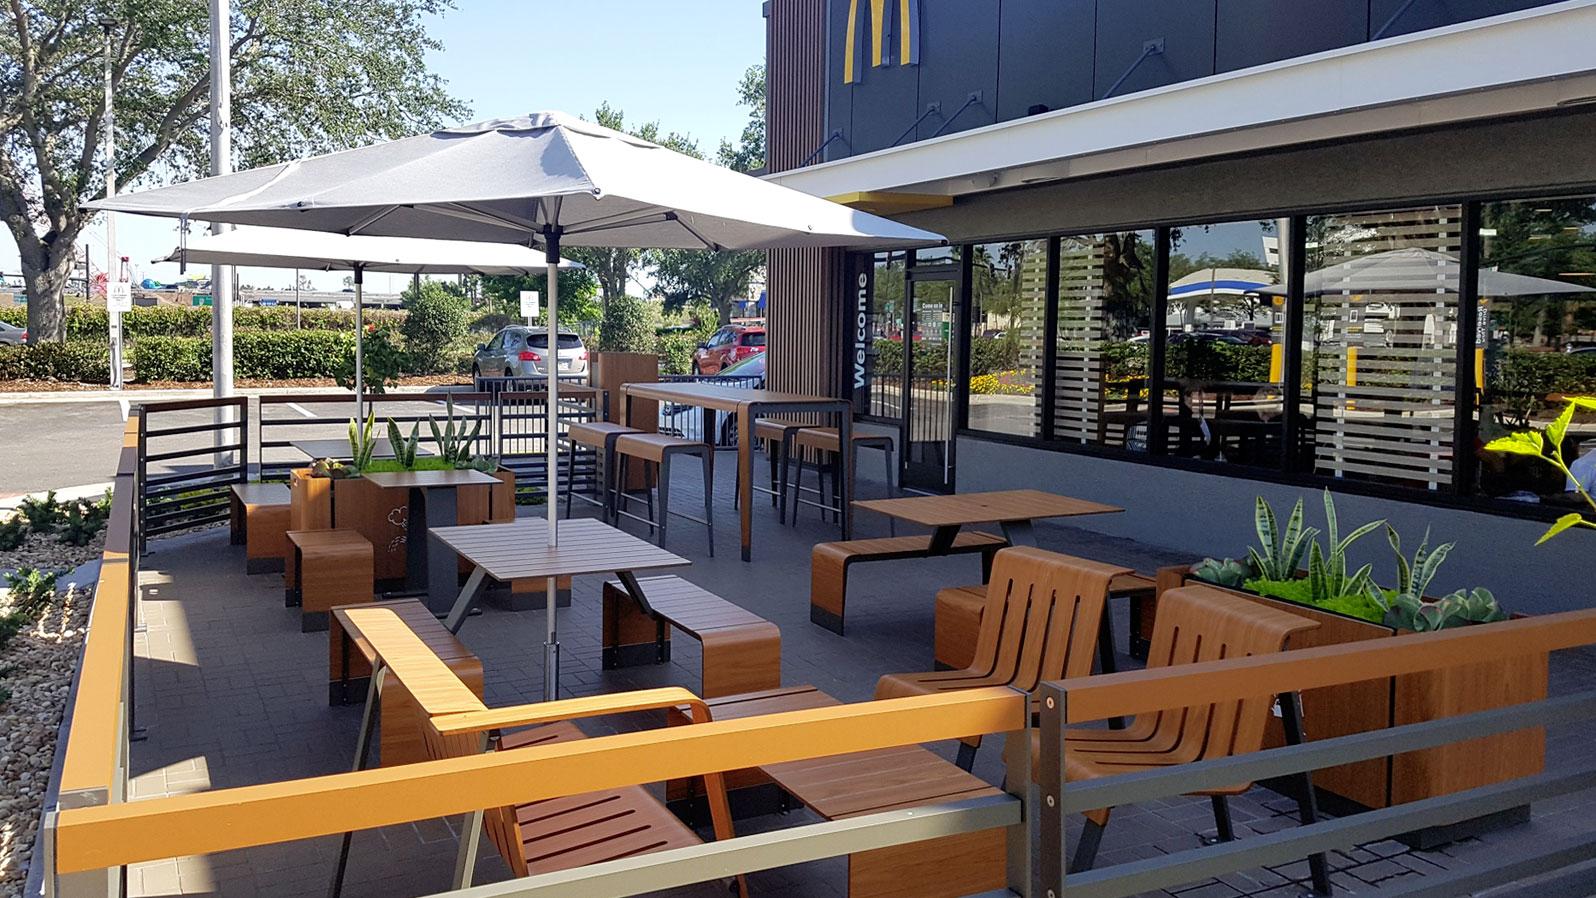 Aubrilam-McDonald's-USA_mobilier